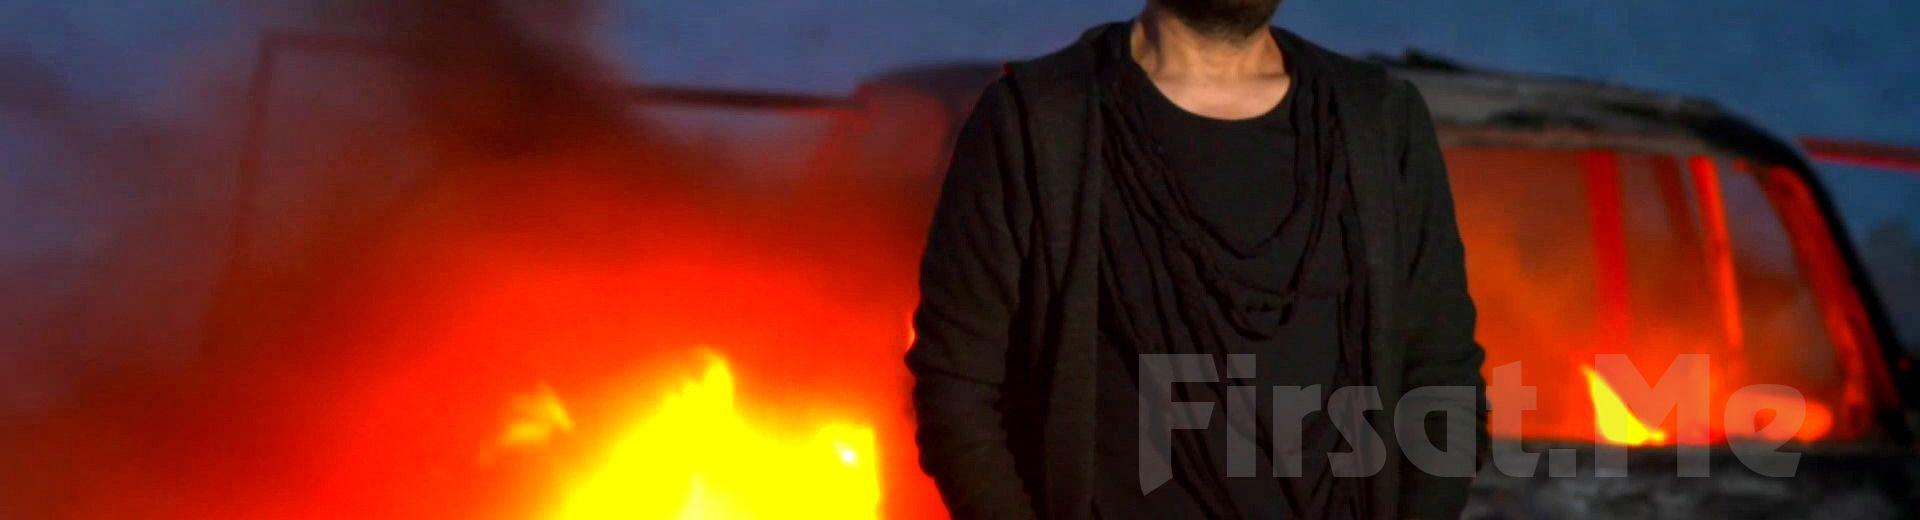 Beyrut Performance Kartal Sahne'de 23 Mart'ta ÜMİT YAŞAR Konser Giriş Bileti